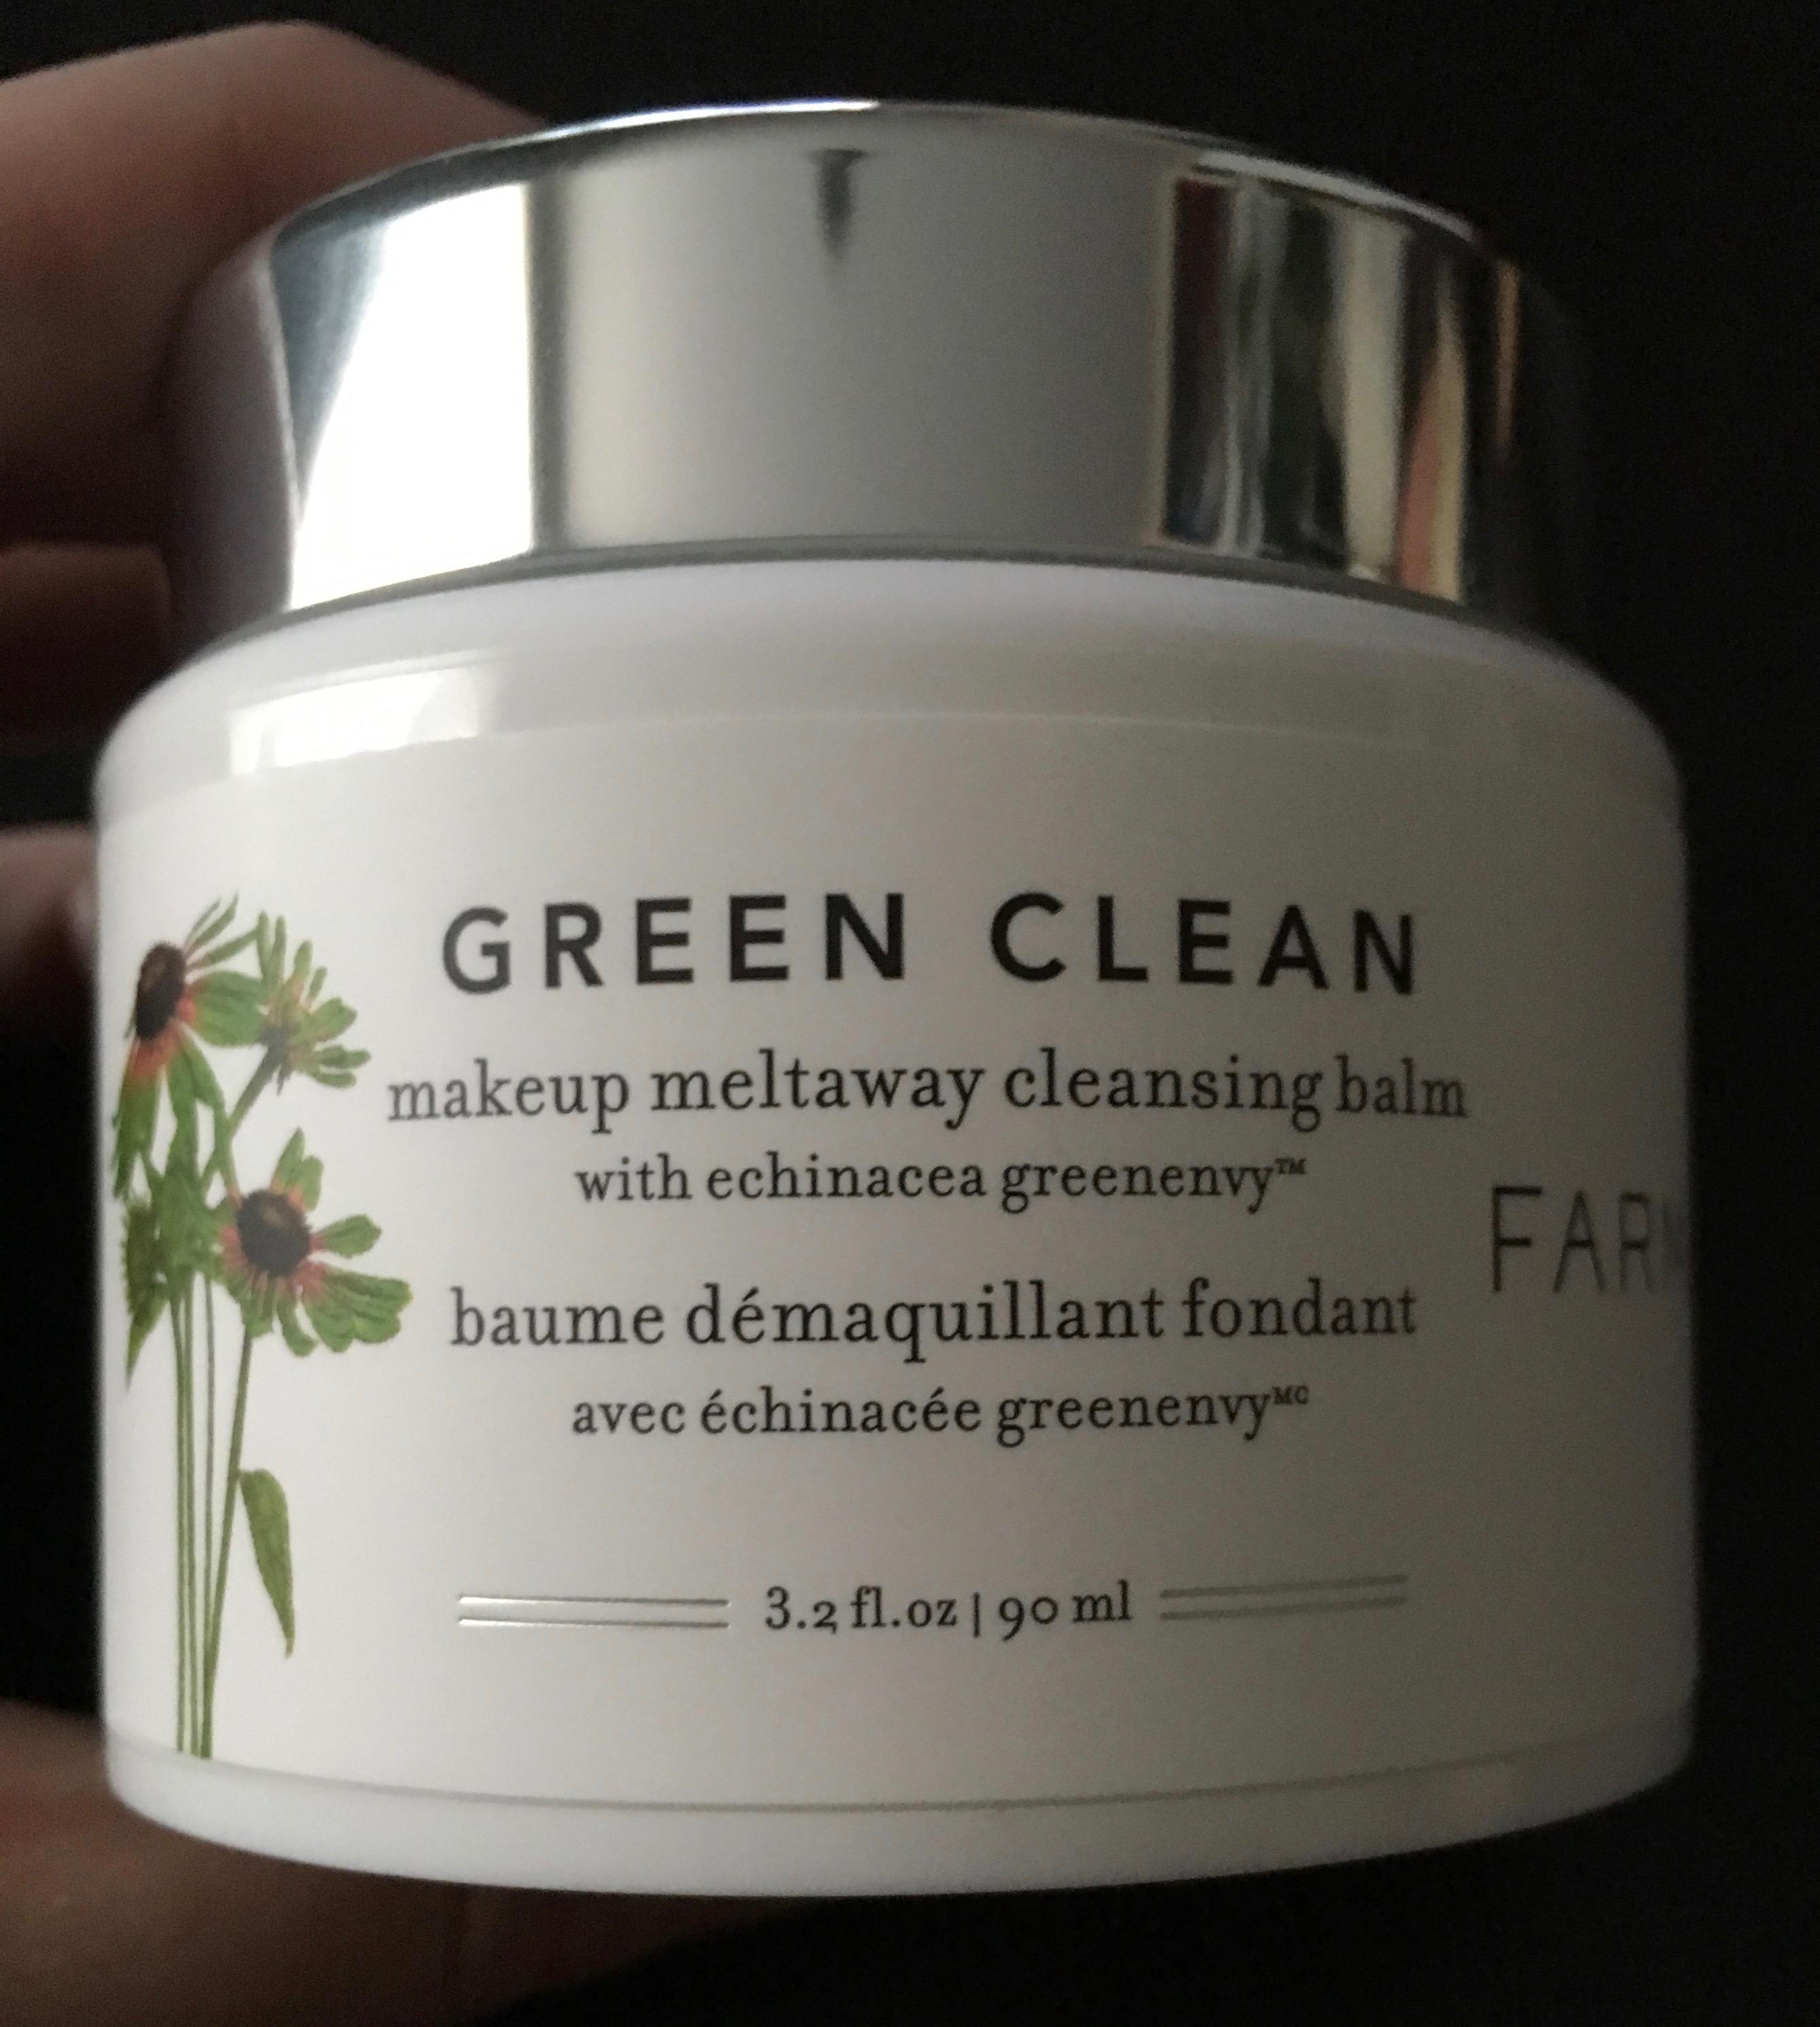 Farmacy Beauty Green Clean Review - a brash attitude